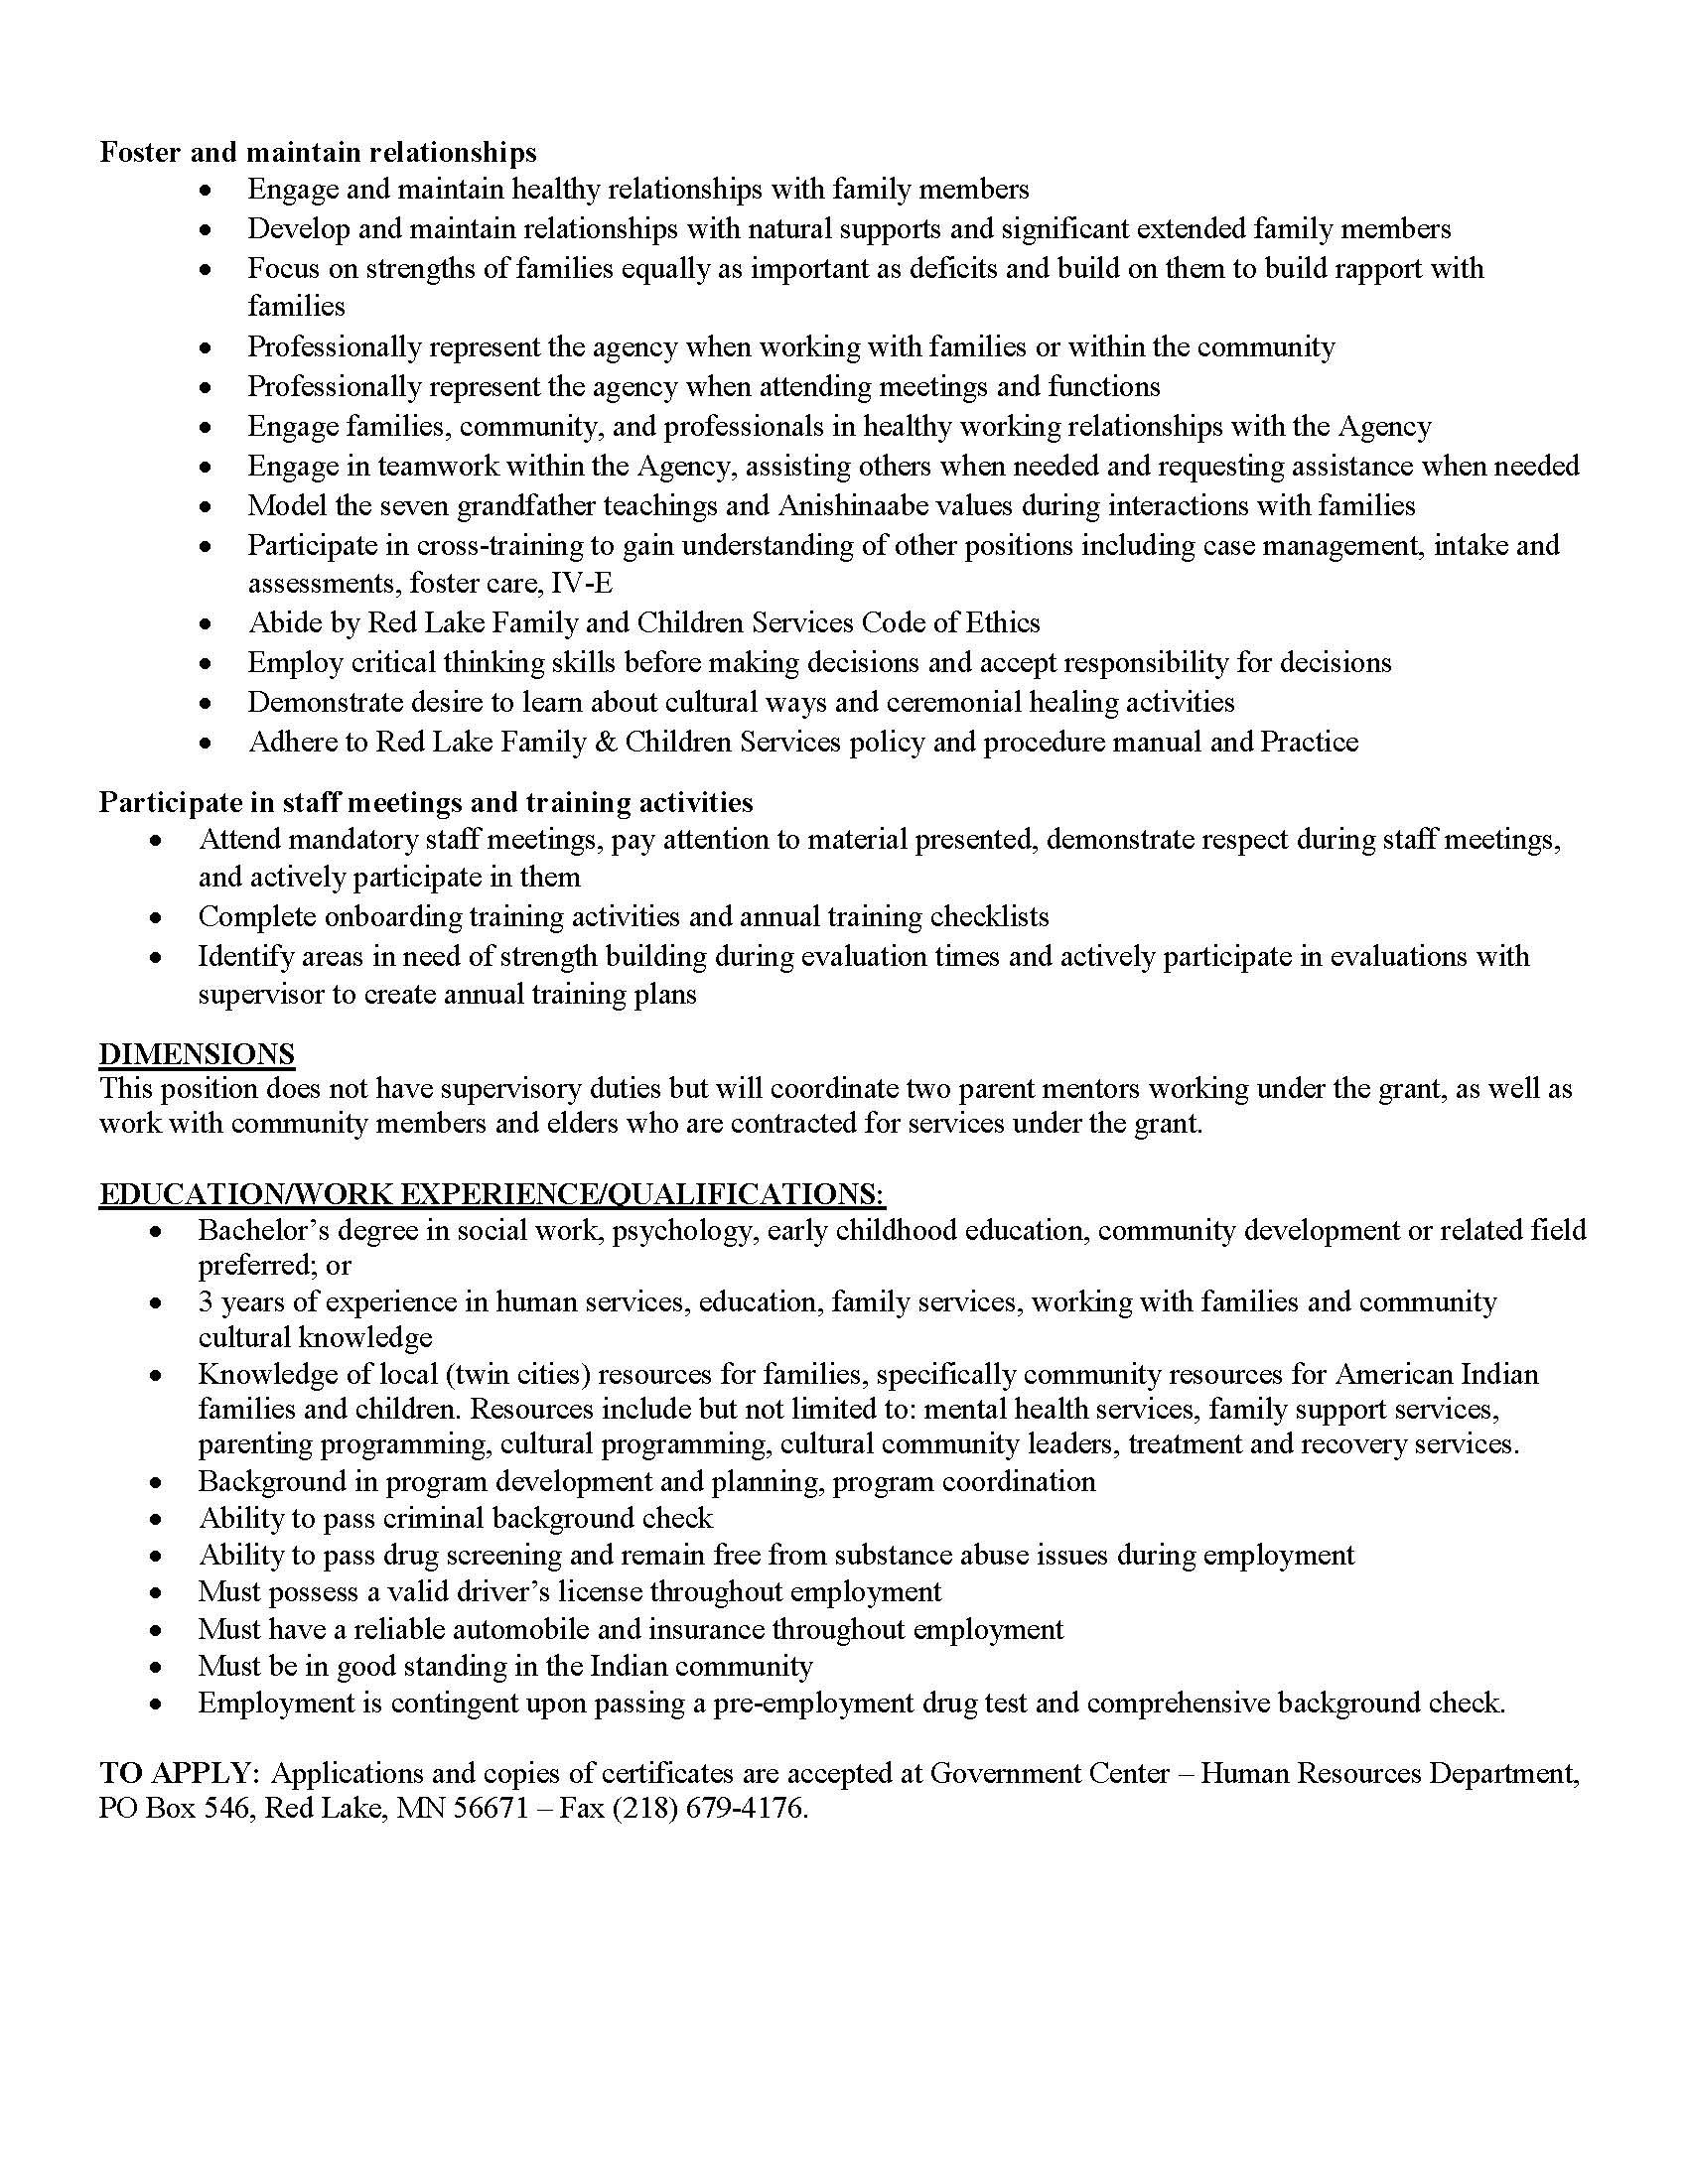 Urban Indian Child Welfare Community Hub Program Coordinator-Family Children Services-Job Posting 5-20-2021_Page_2